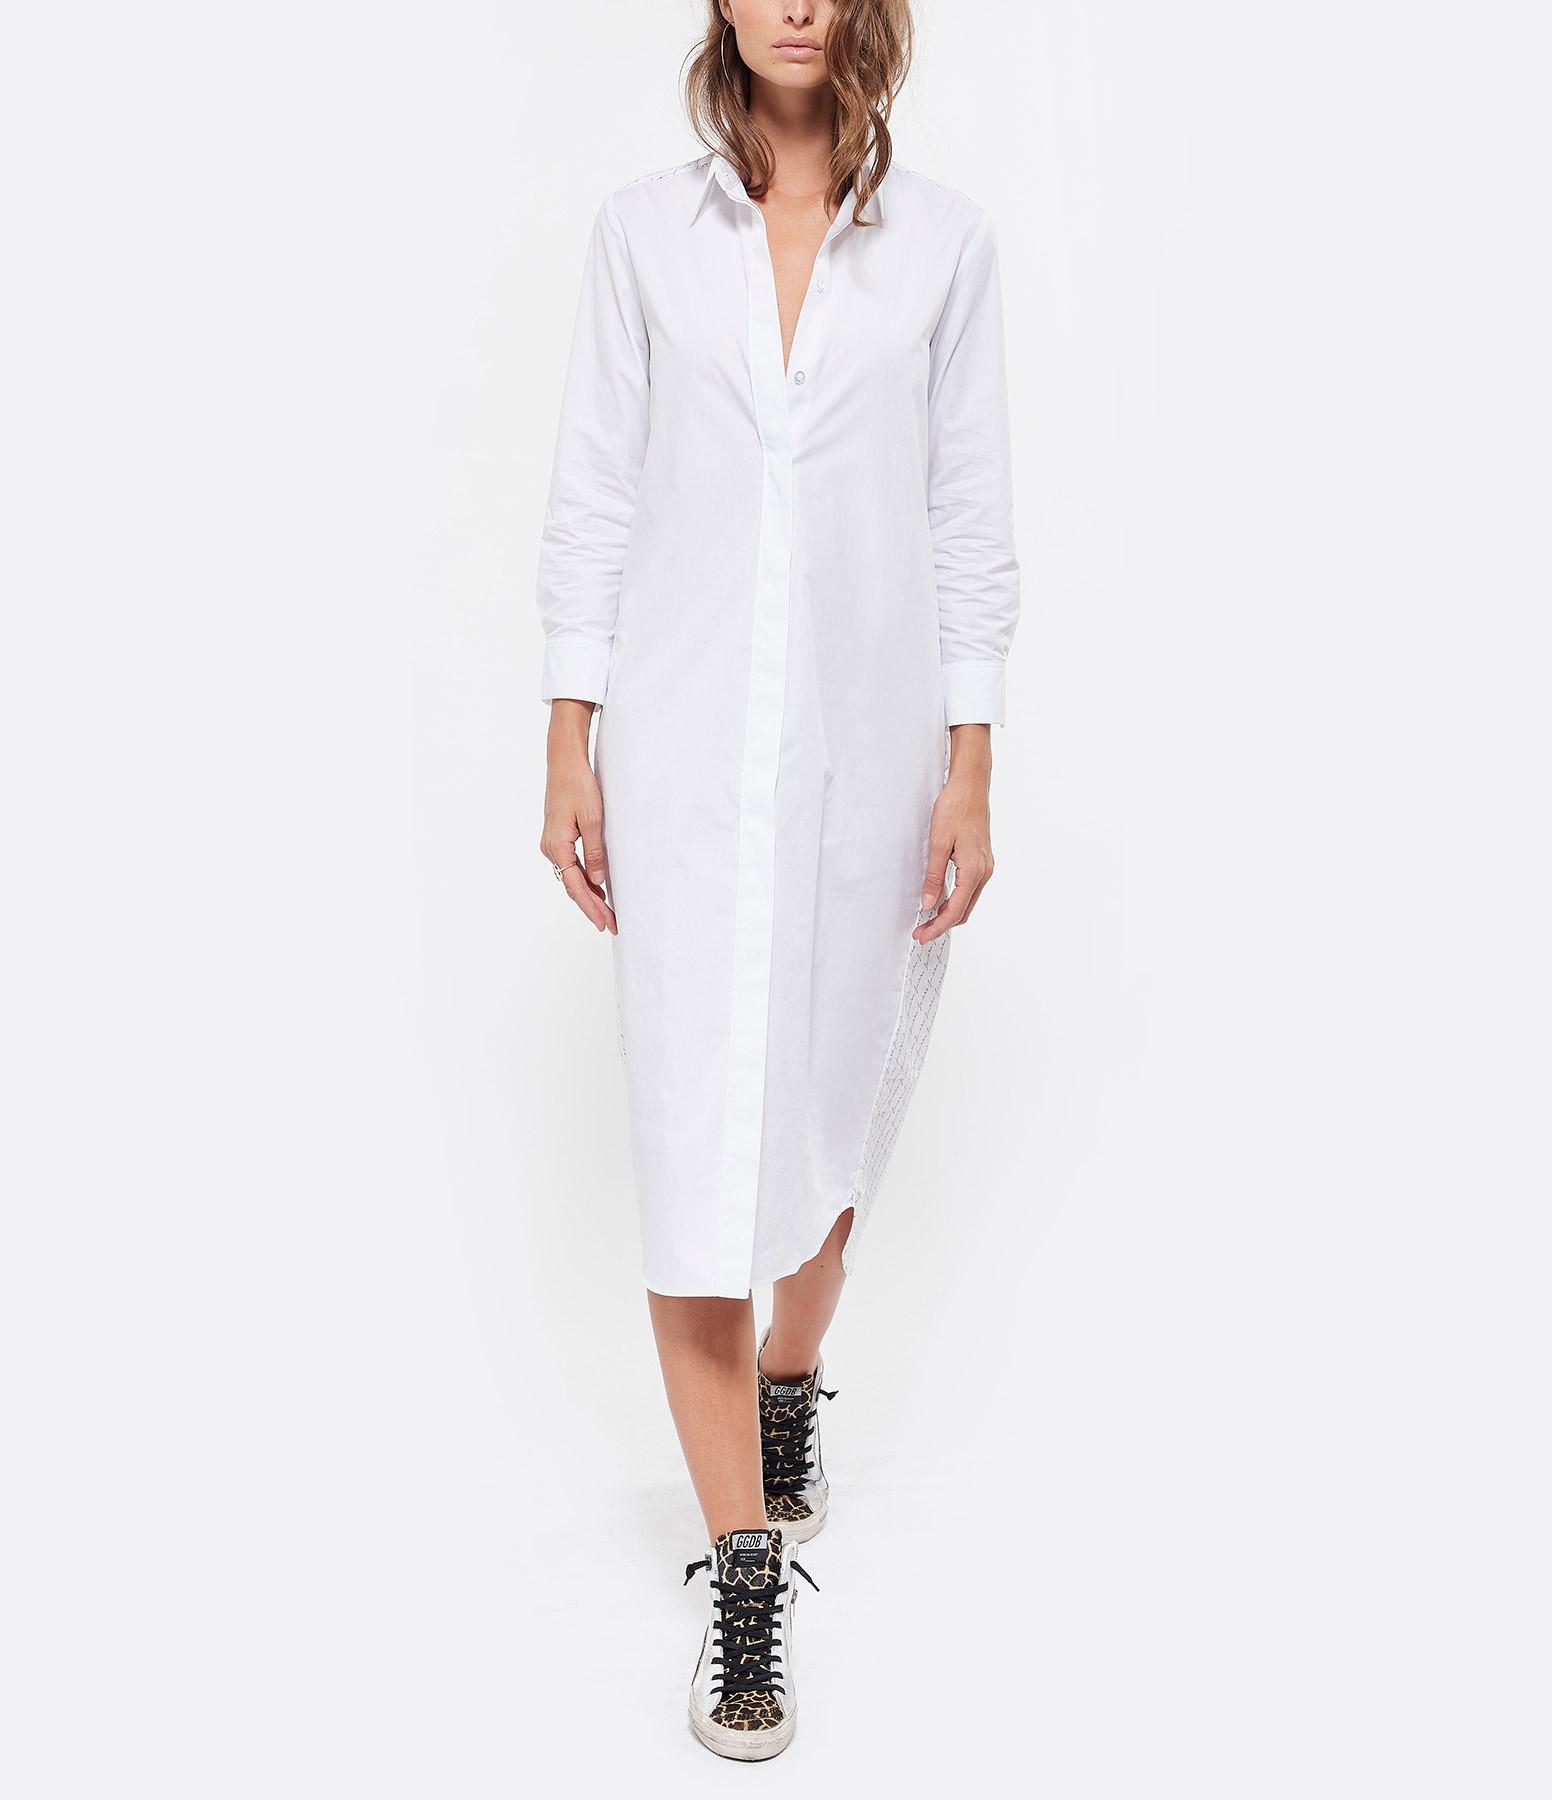 JEANNE VOULAND - Robe Chemise Bayae Blanc Rayures Noir